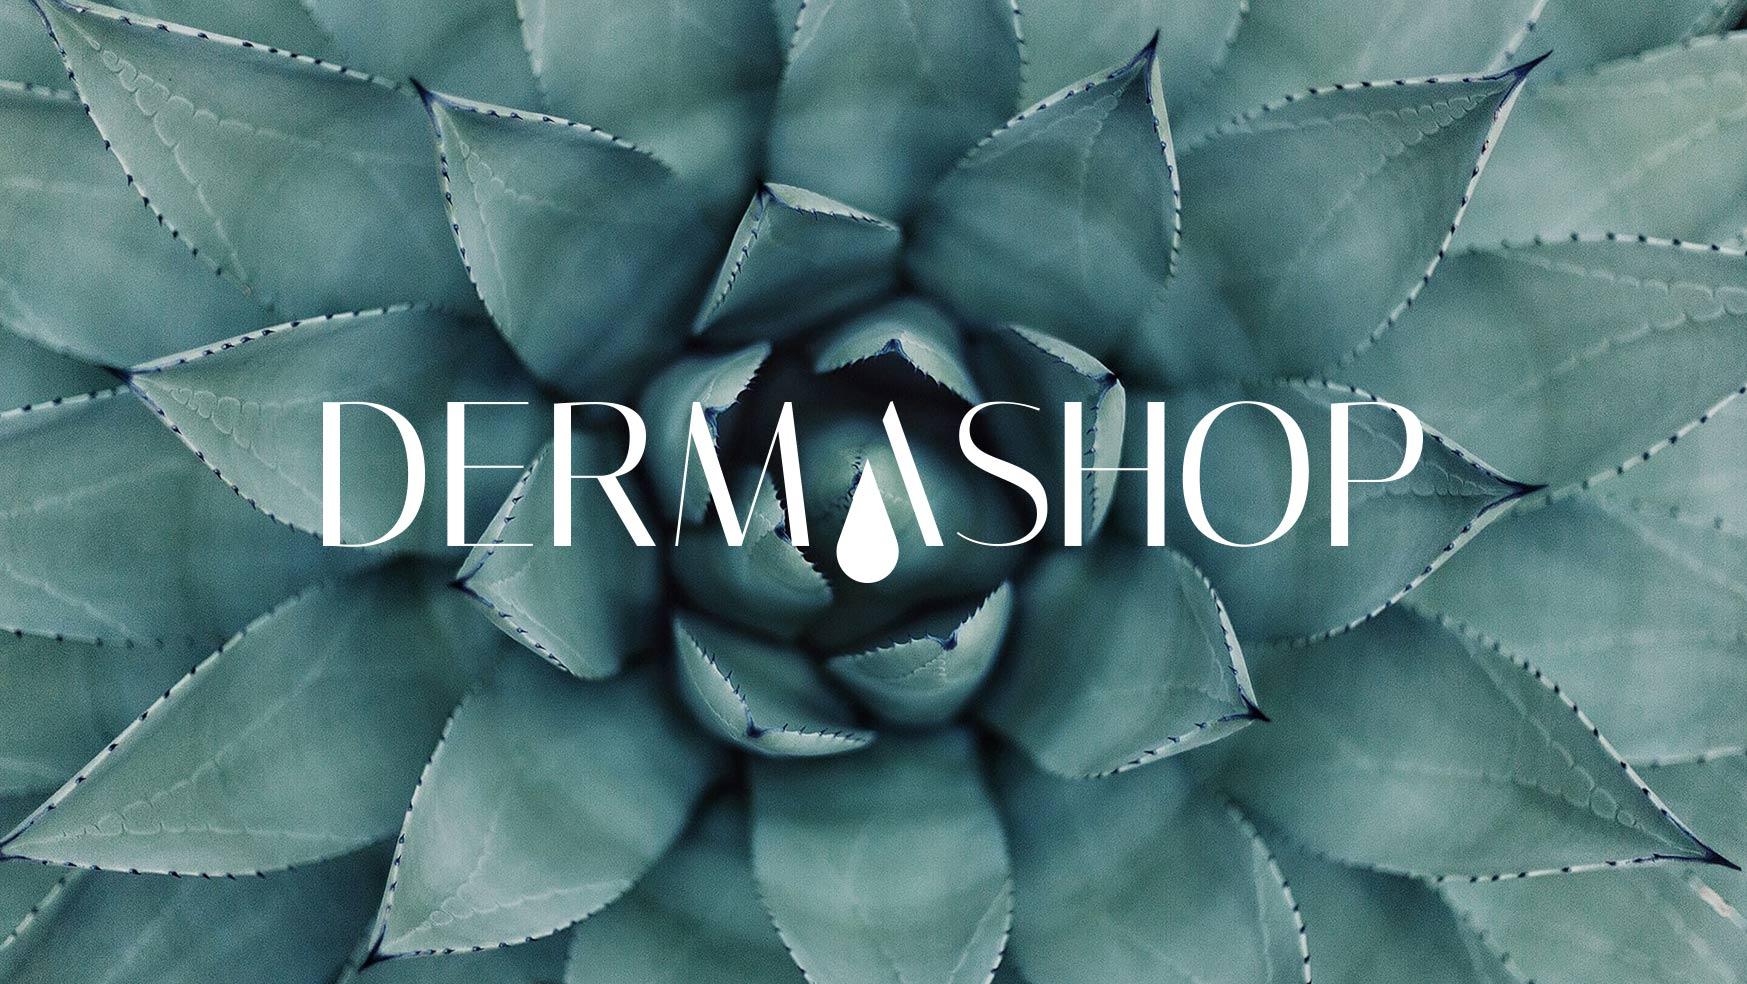 Dermashop desenvolvimento do Branding, marketing digital, web design